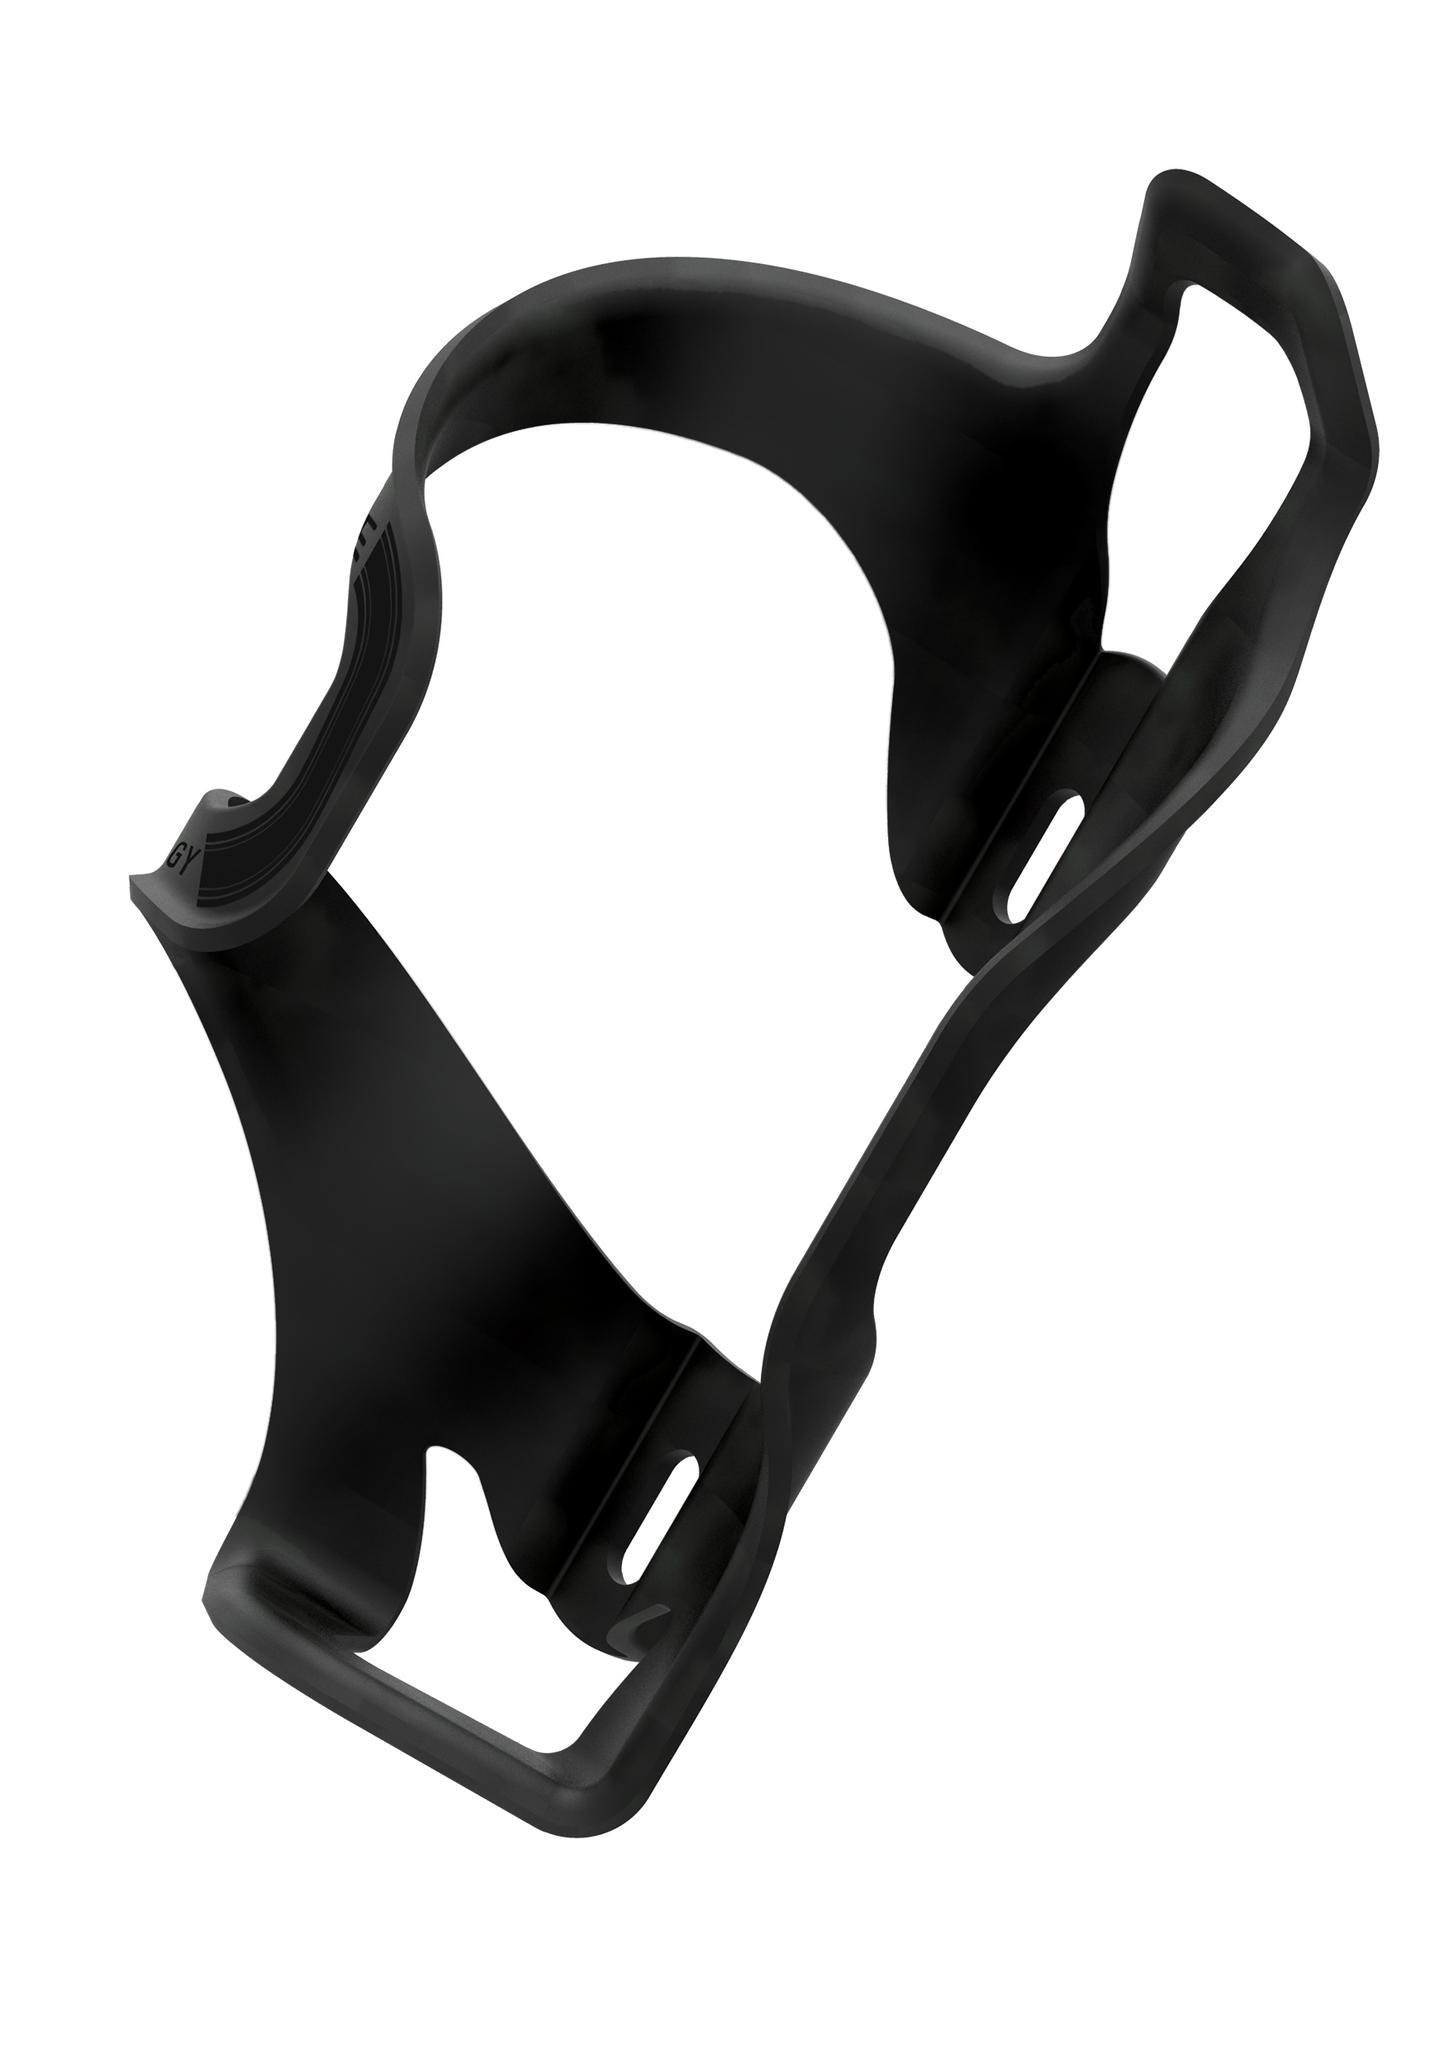 Lezyne Flaschenhalter Carbon Cage SL-R UD Carbon